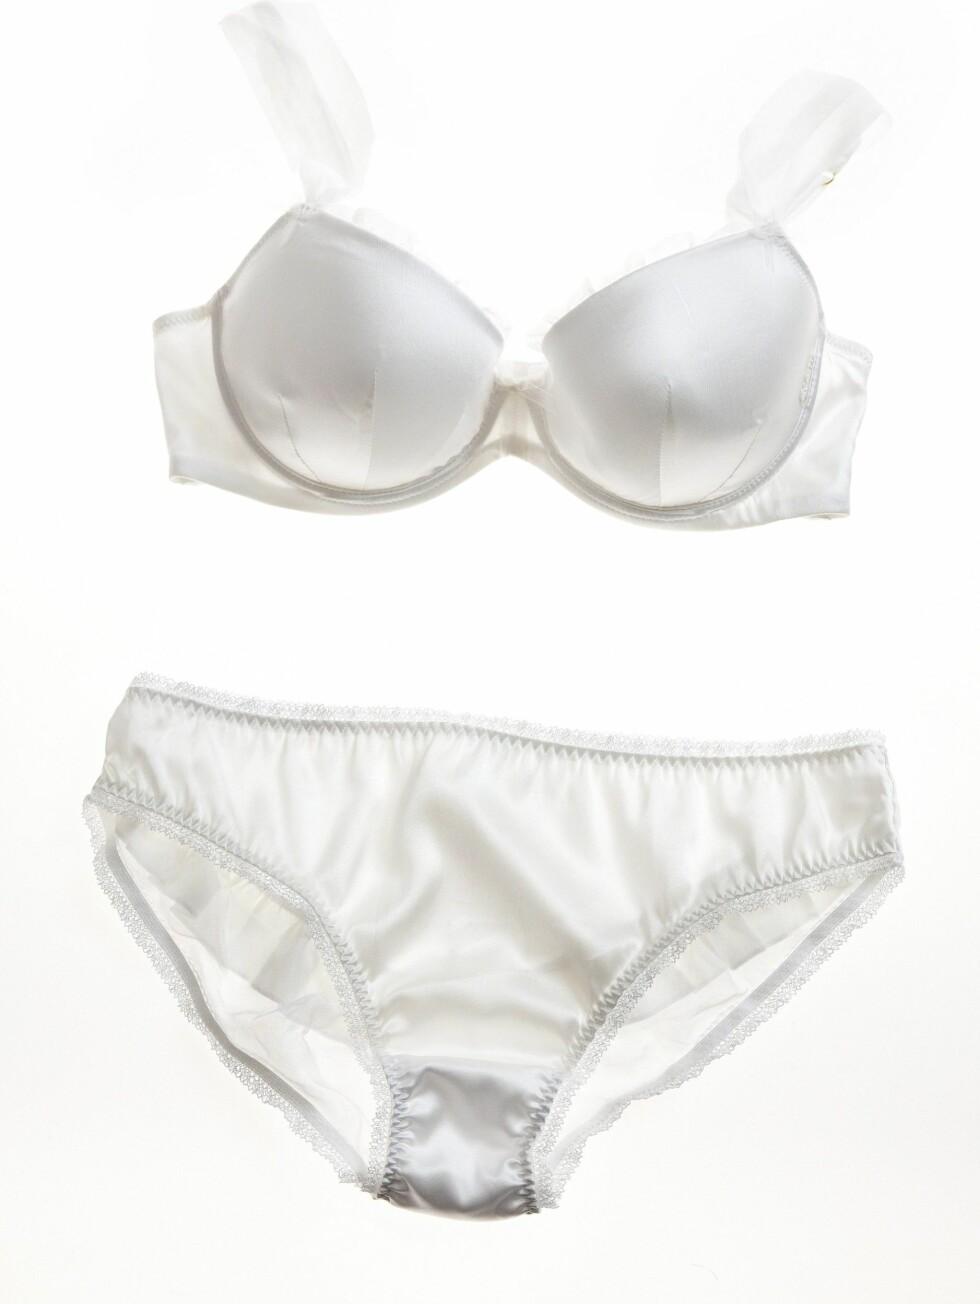 KLASSISK: Bh som sitter fint under t-skjorter (kr 300) og offwhite silketruse (kr 150, Lindex).